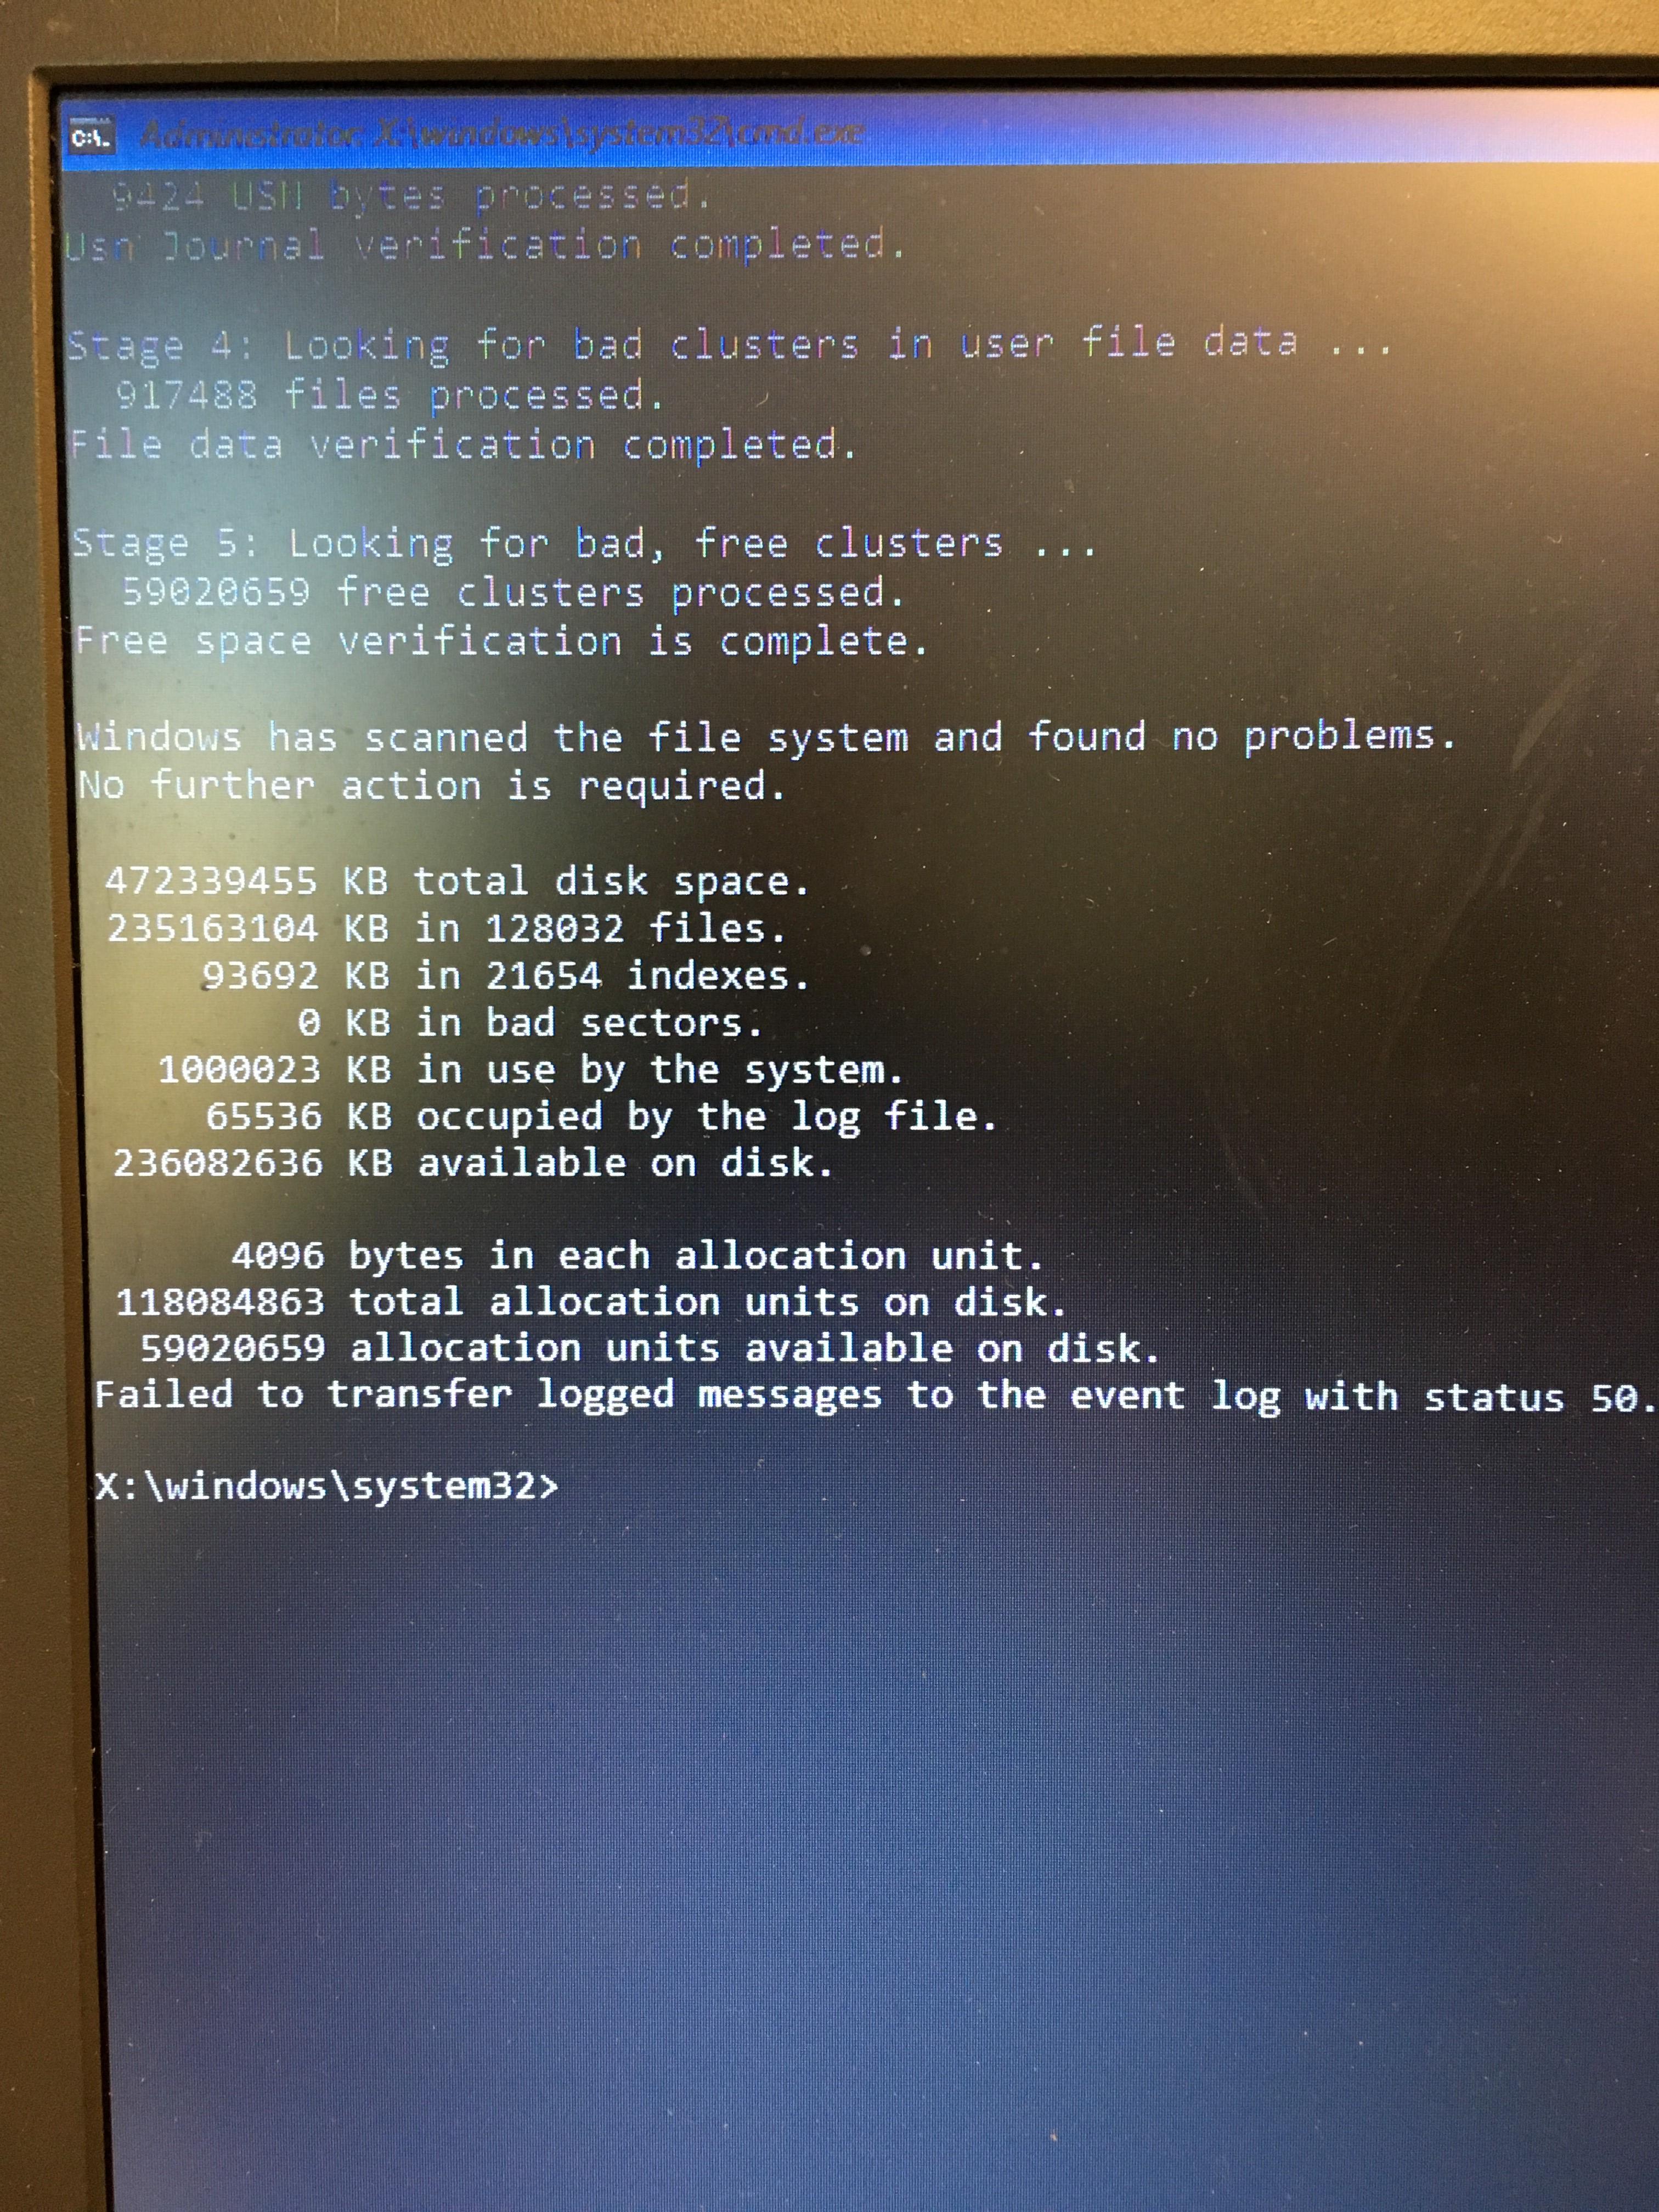 Automatic Repair Error SrtTrail txt - Microsoft Community